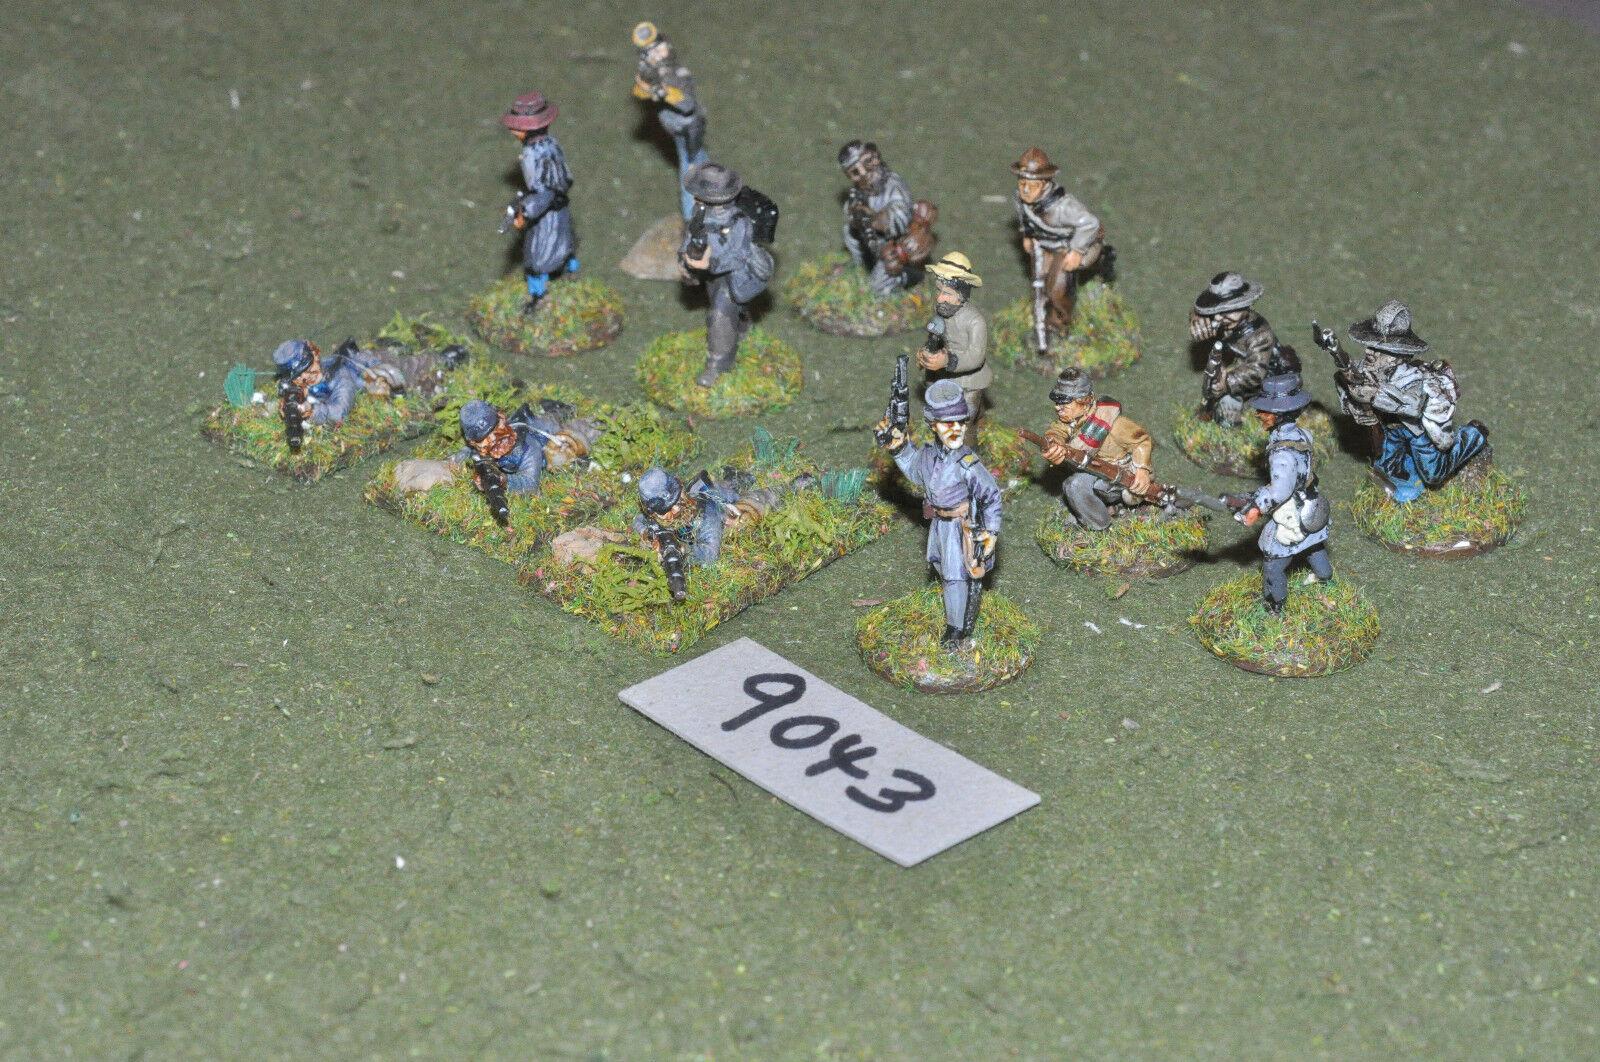 25mm ACW   confederate - civil war 14 skirmishers figs metal - inf (9043)